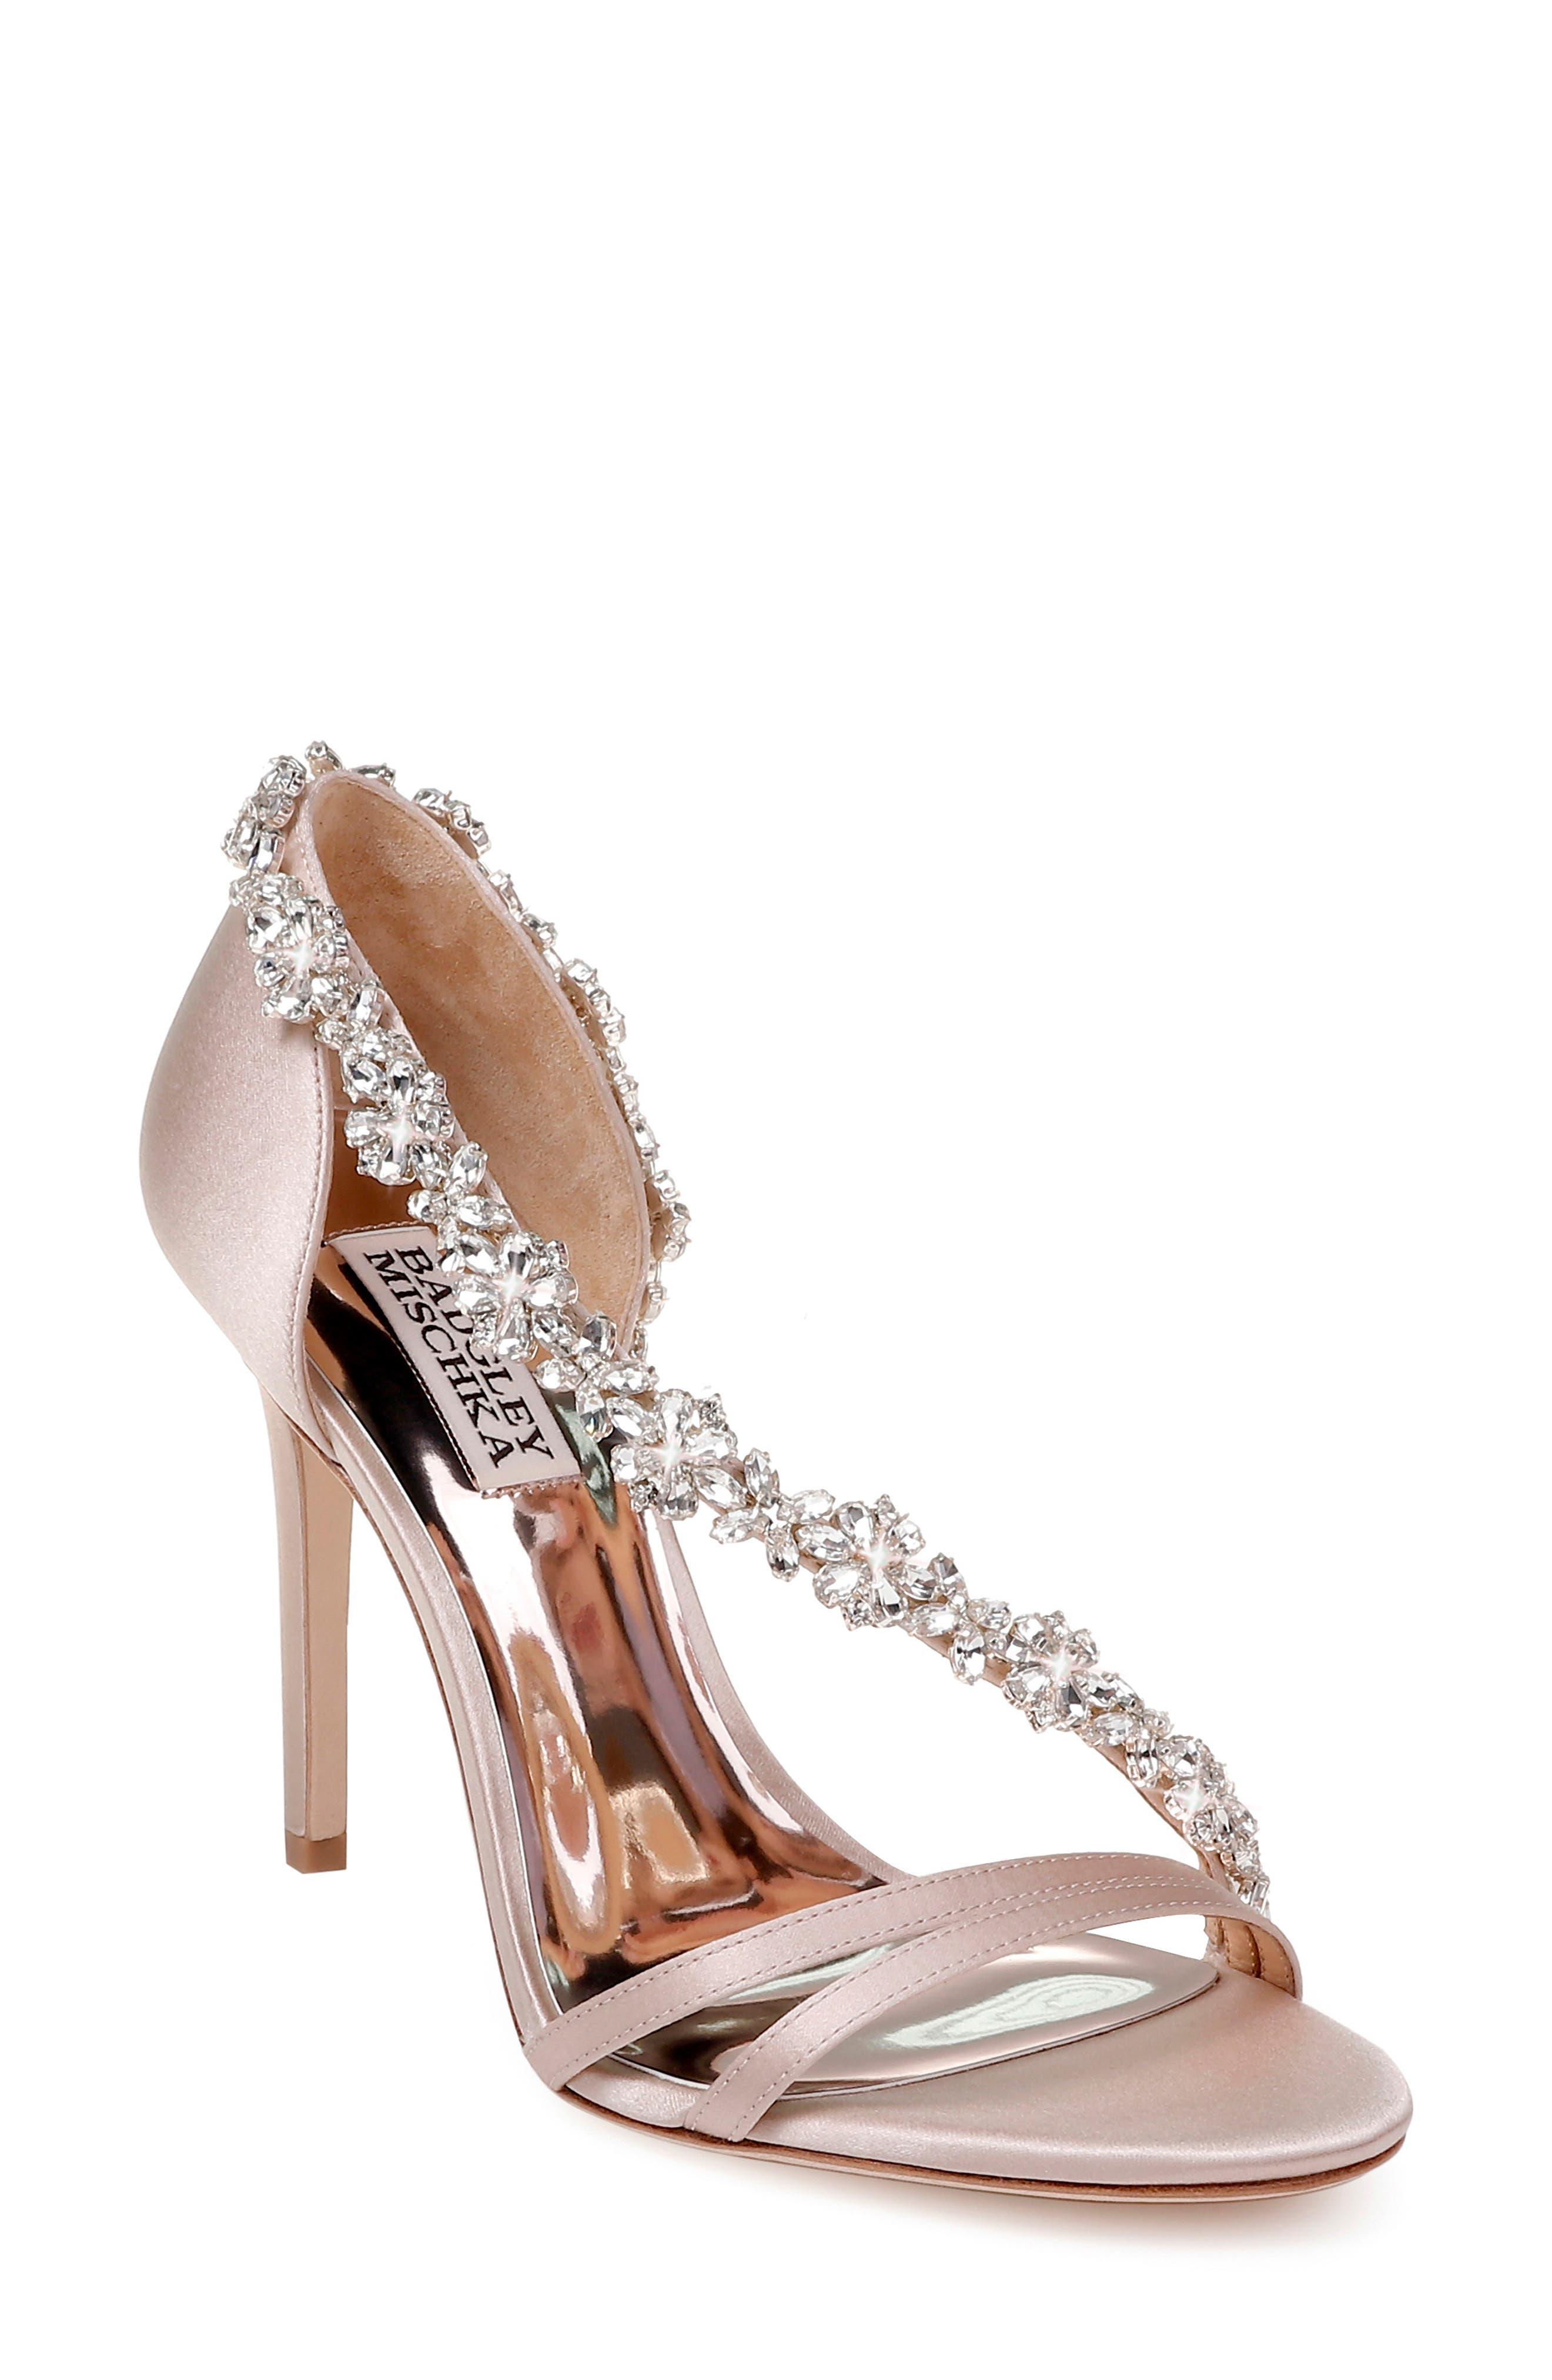 Badley Mischka Voletta Crystal Embellished Sandal- Beige